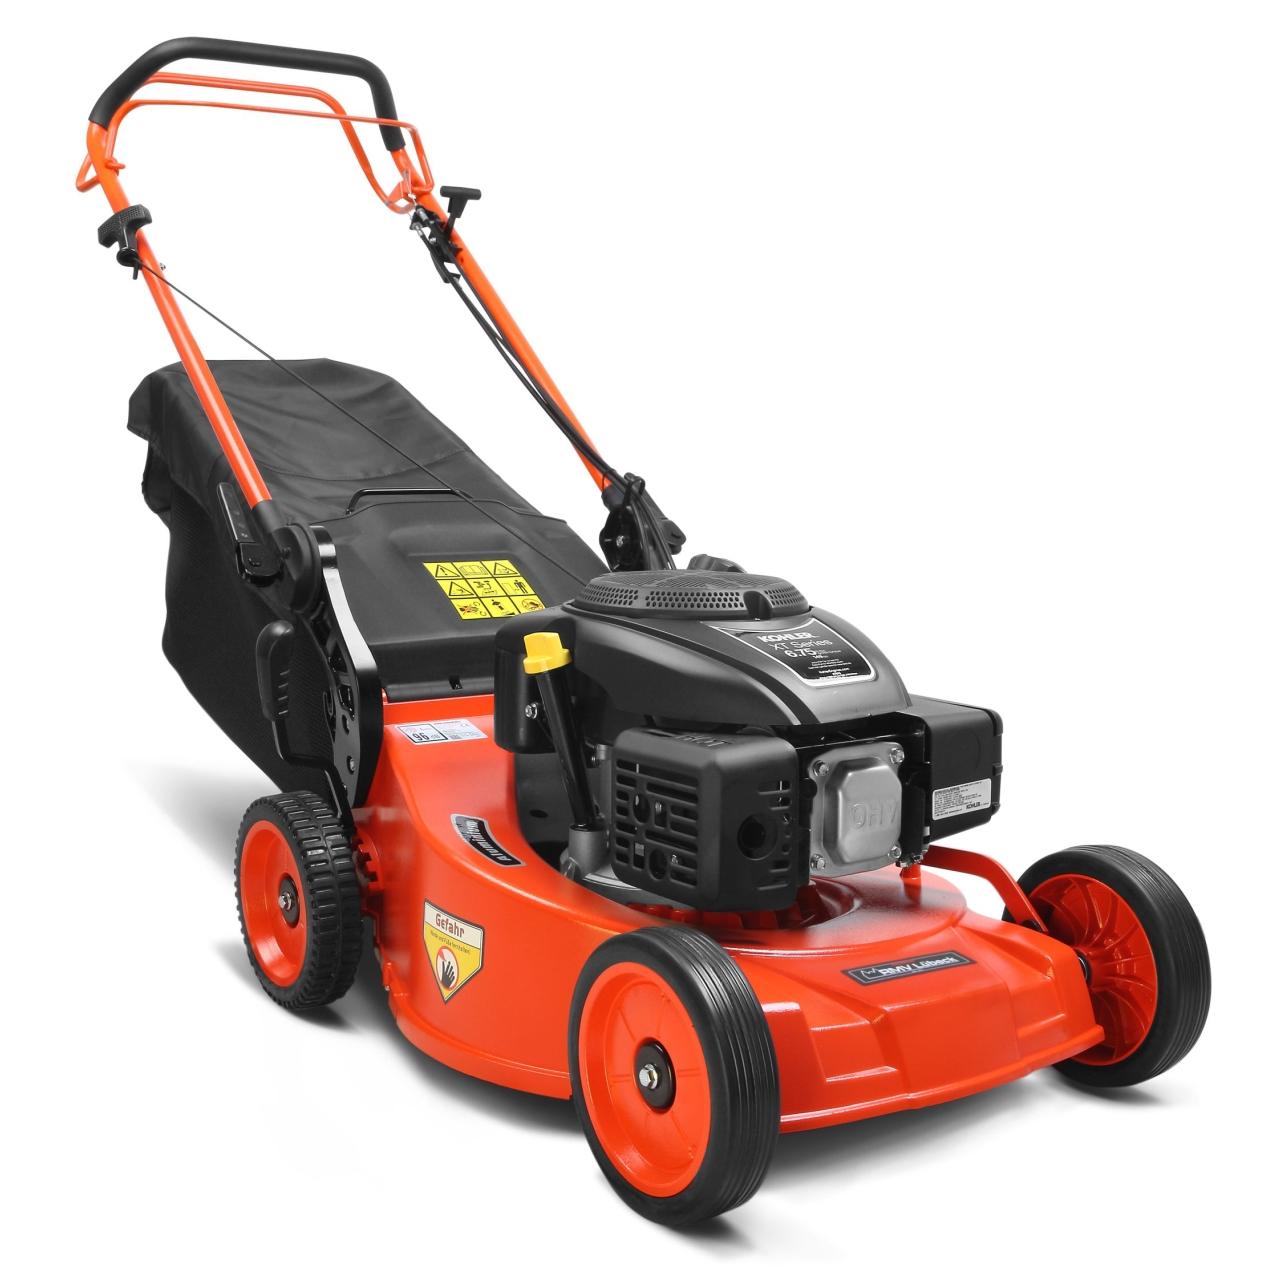 Benzin-Rasenmäher WB 486 SKL AL